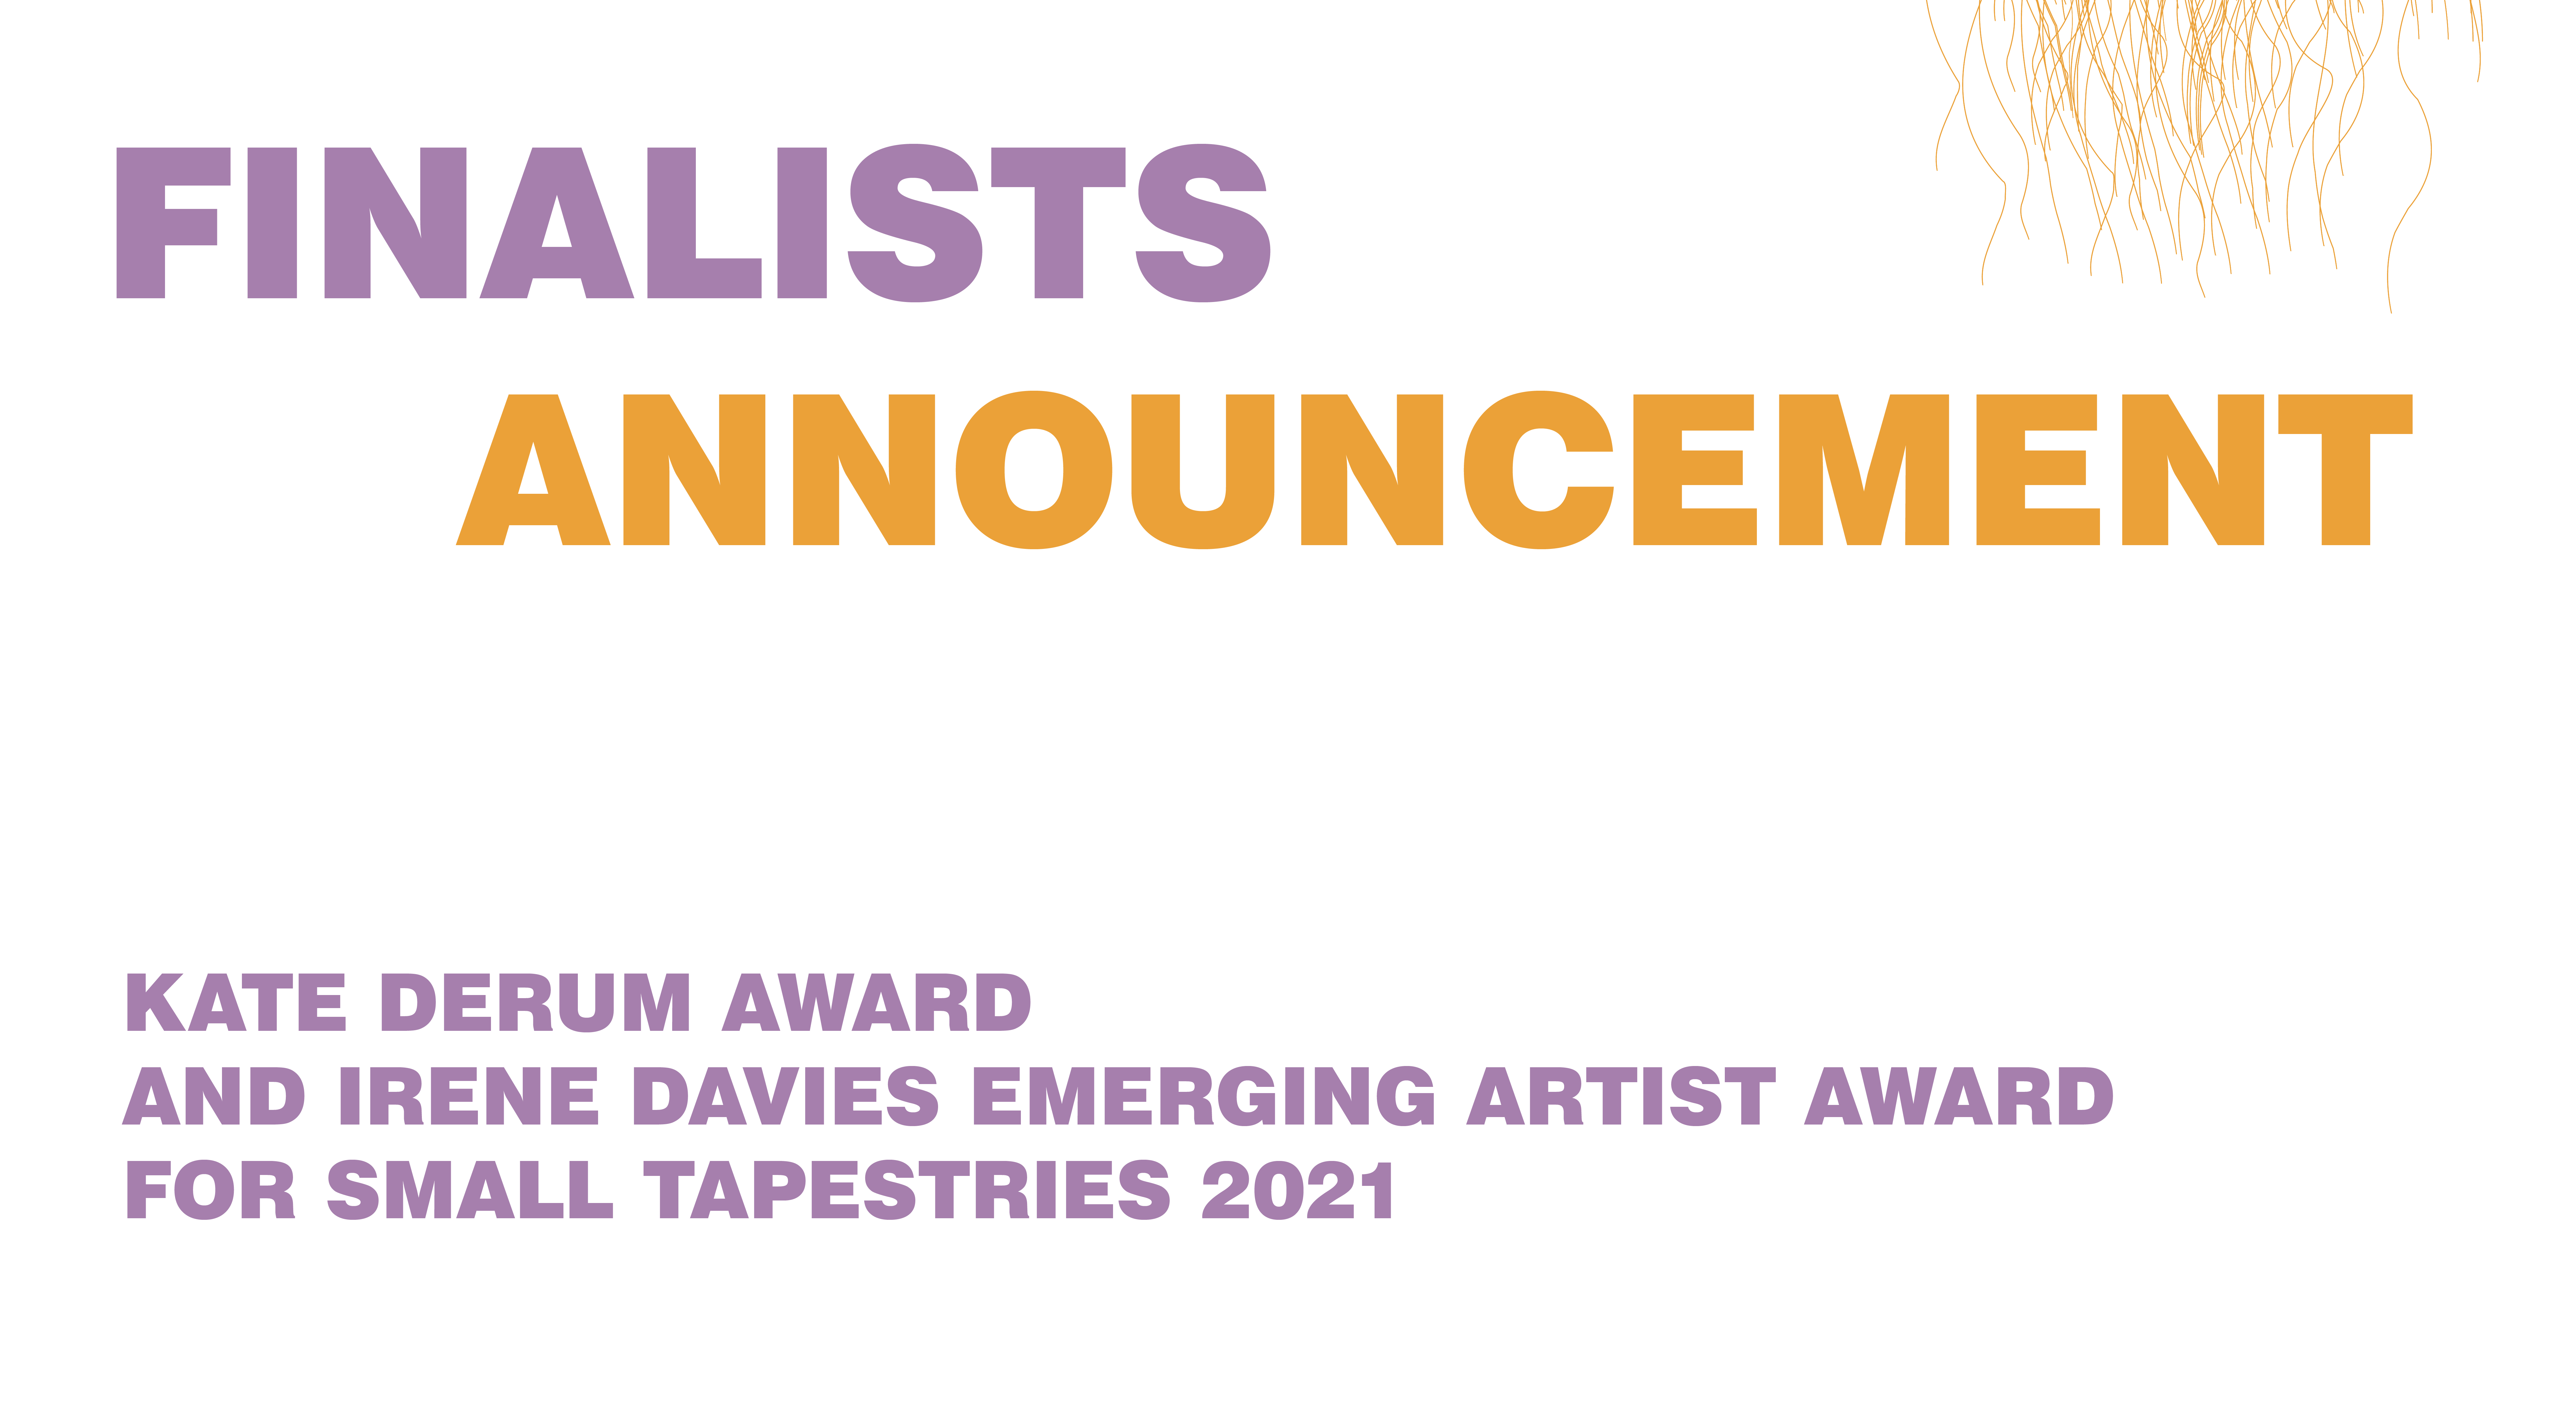 Kate Derum Award & Irene Davies Award Finalists